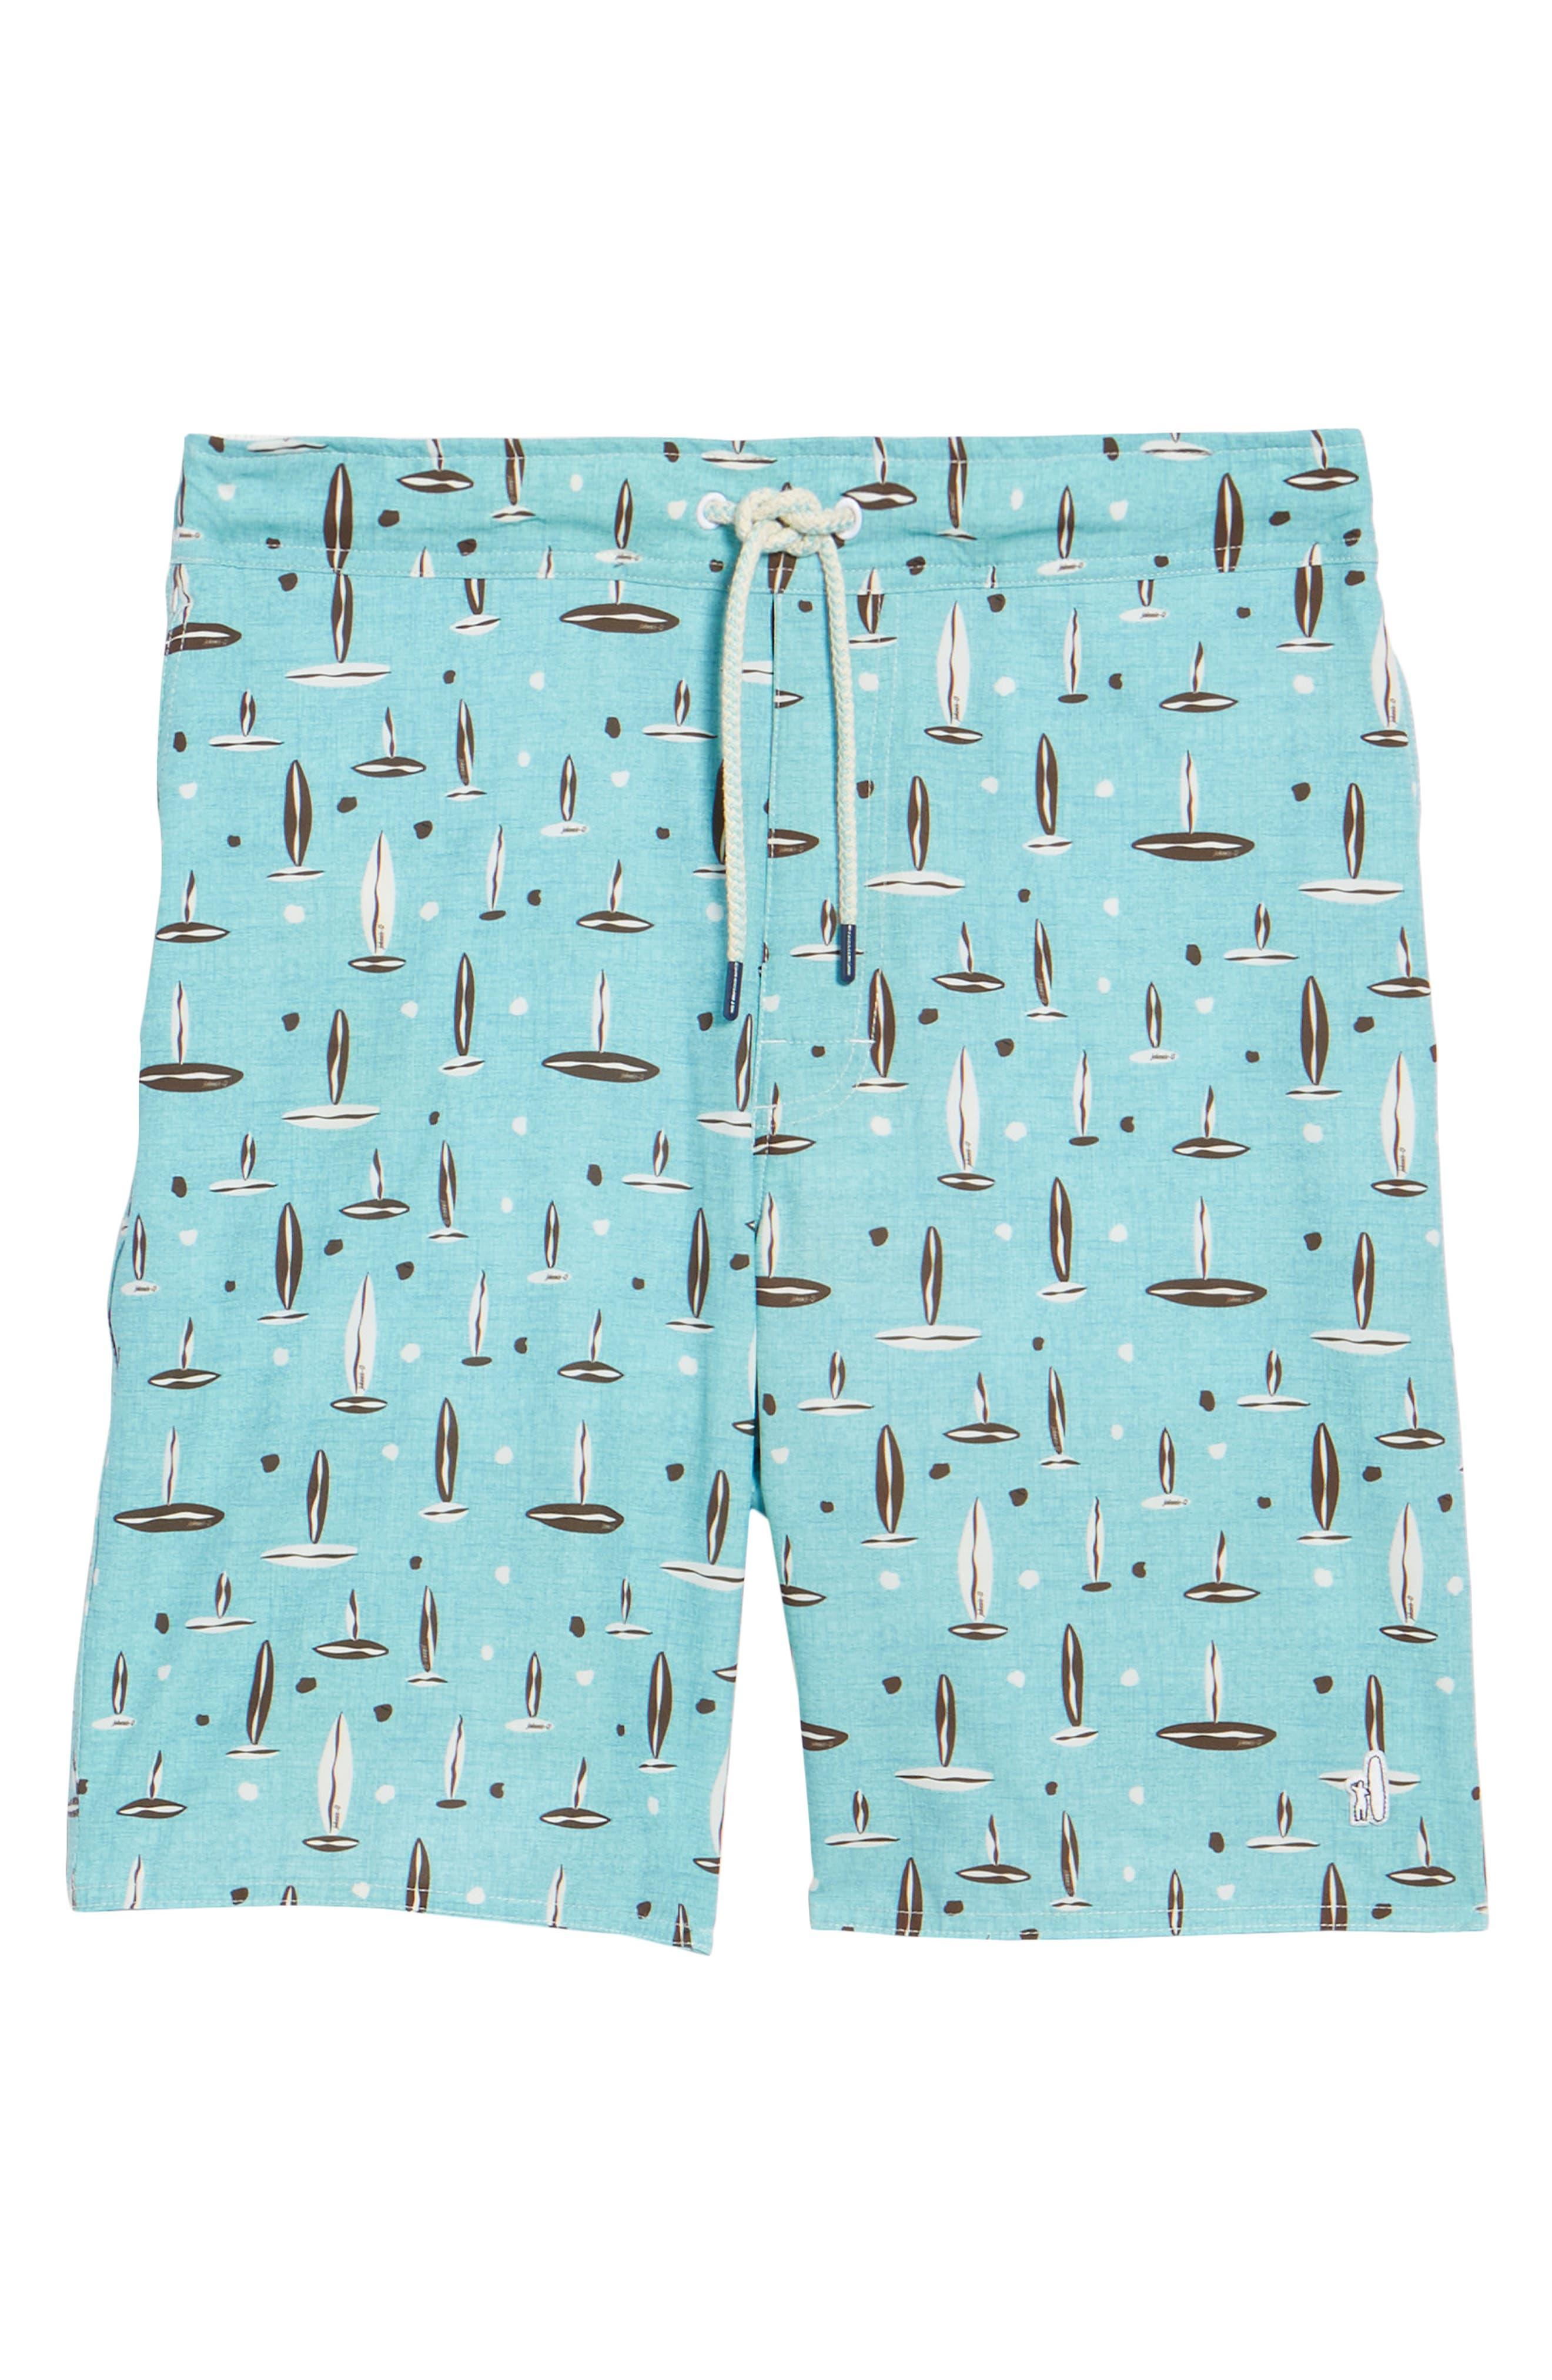 Rowan Regular Fit Board Shorts,                             Alternate thumbnail 6, color,                             SURF